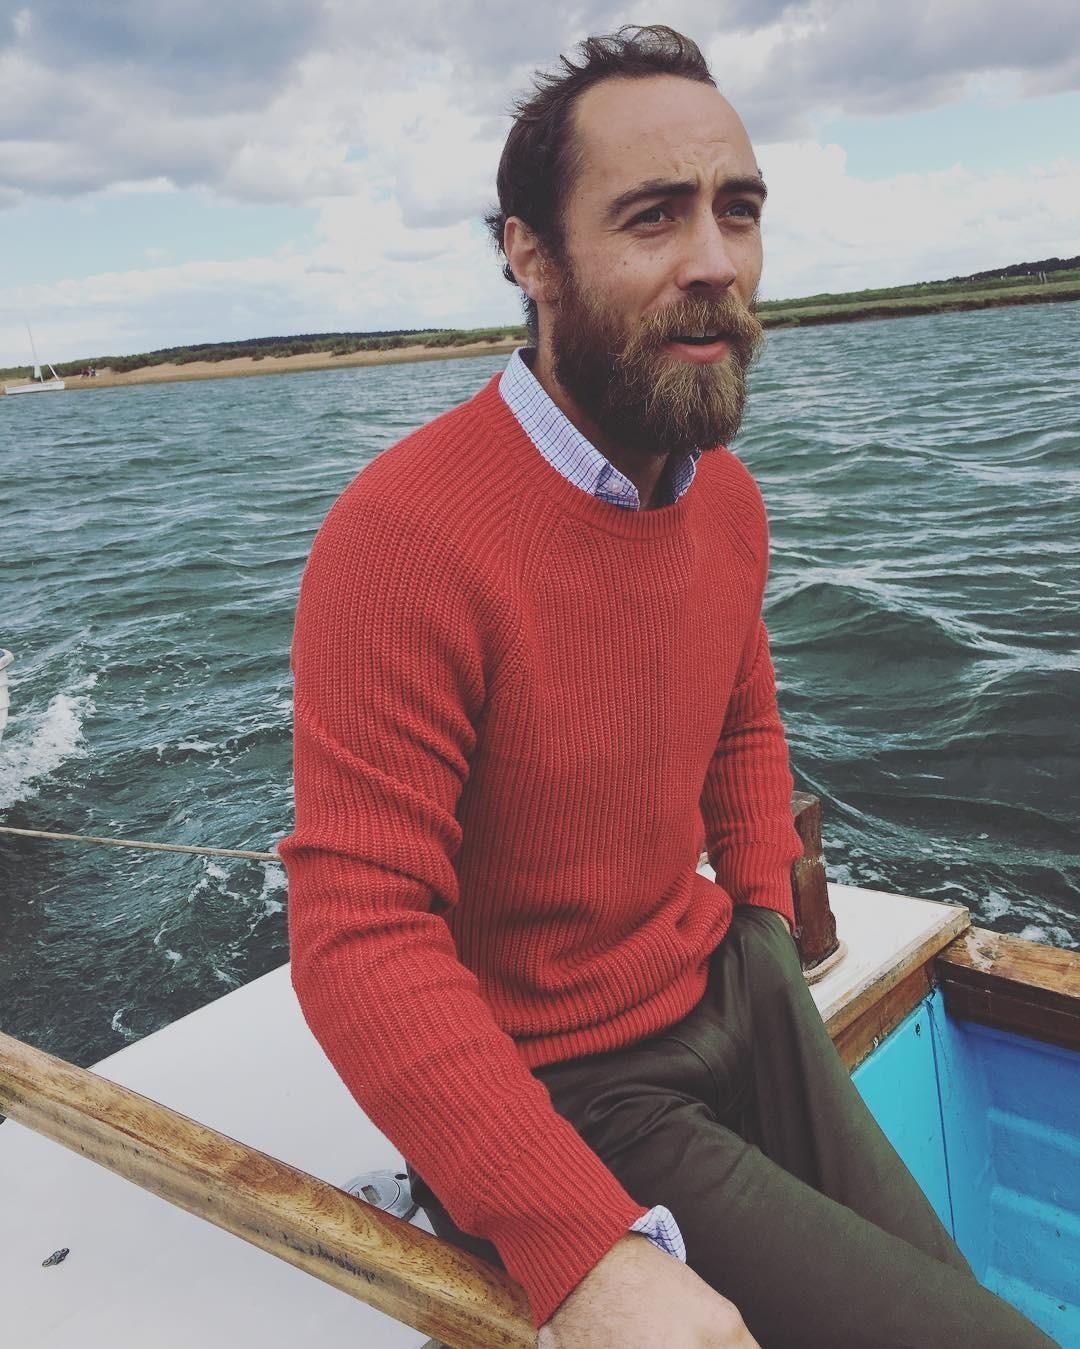 Брат Кейт Миддлтон открыл Instagram и показал, как живет